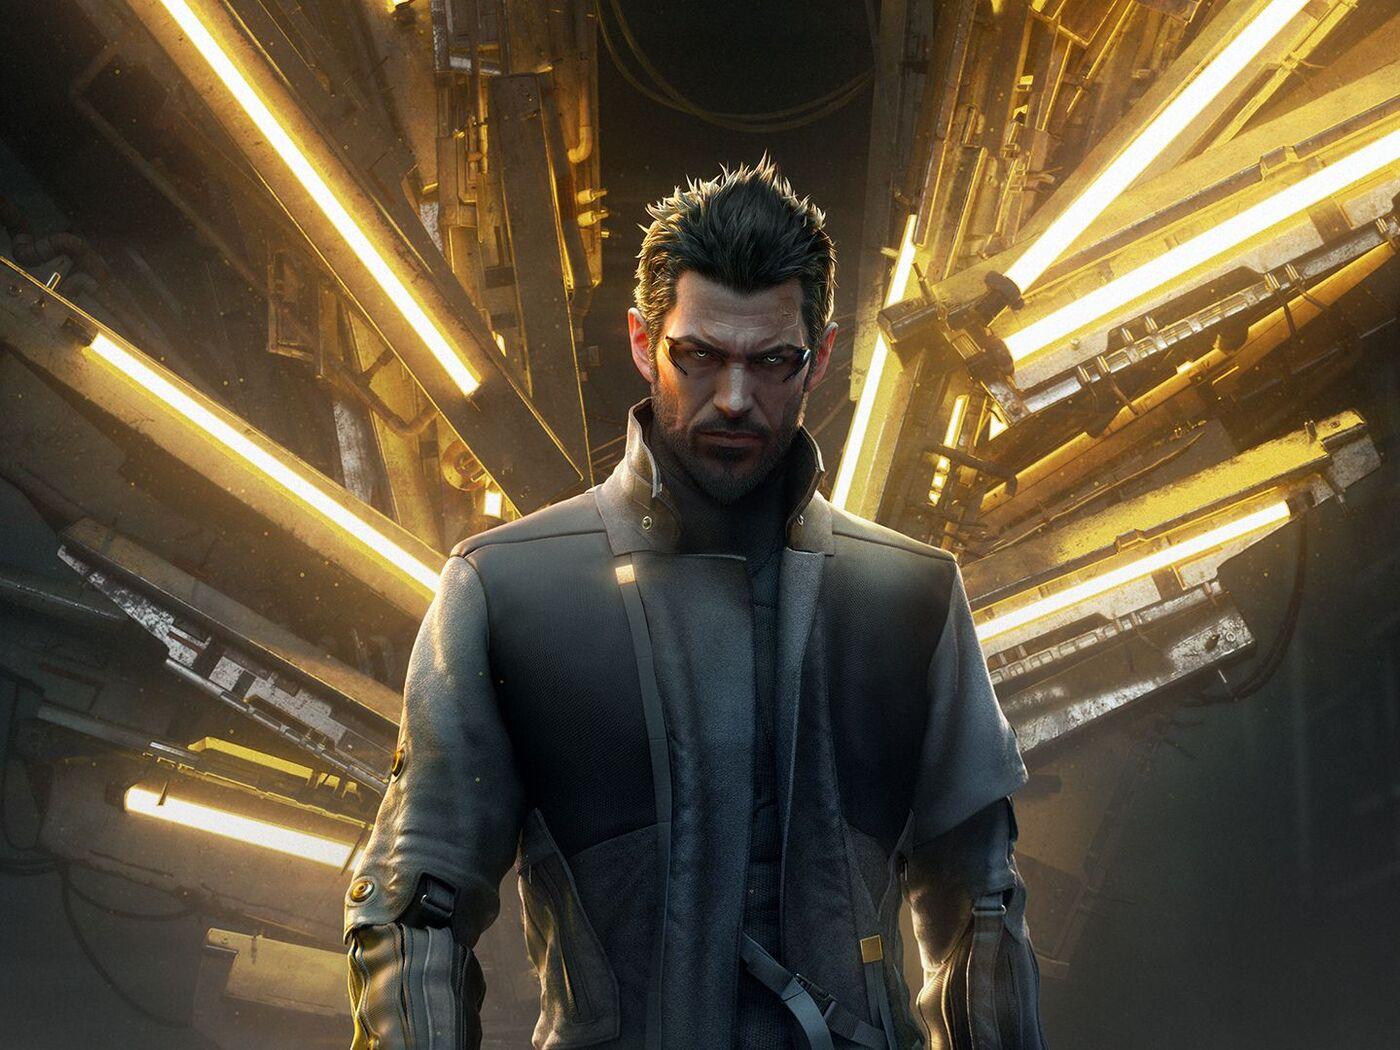 1400x1050 Deus Ex Mankind Divided Hd 1400x1050 Resolution Hd 4k